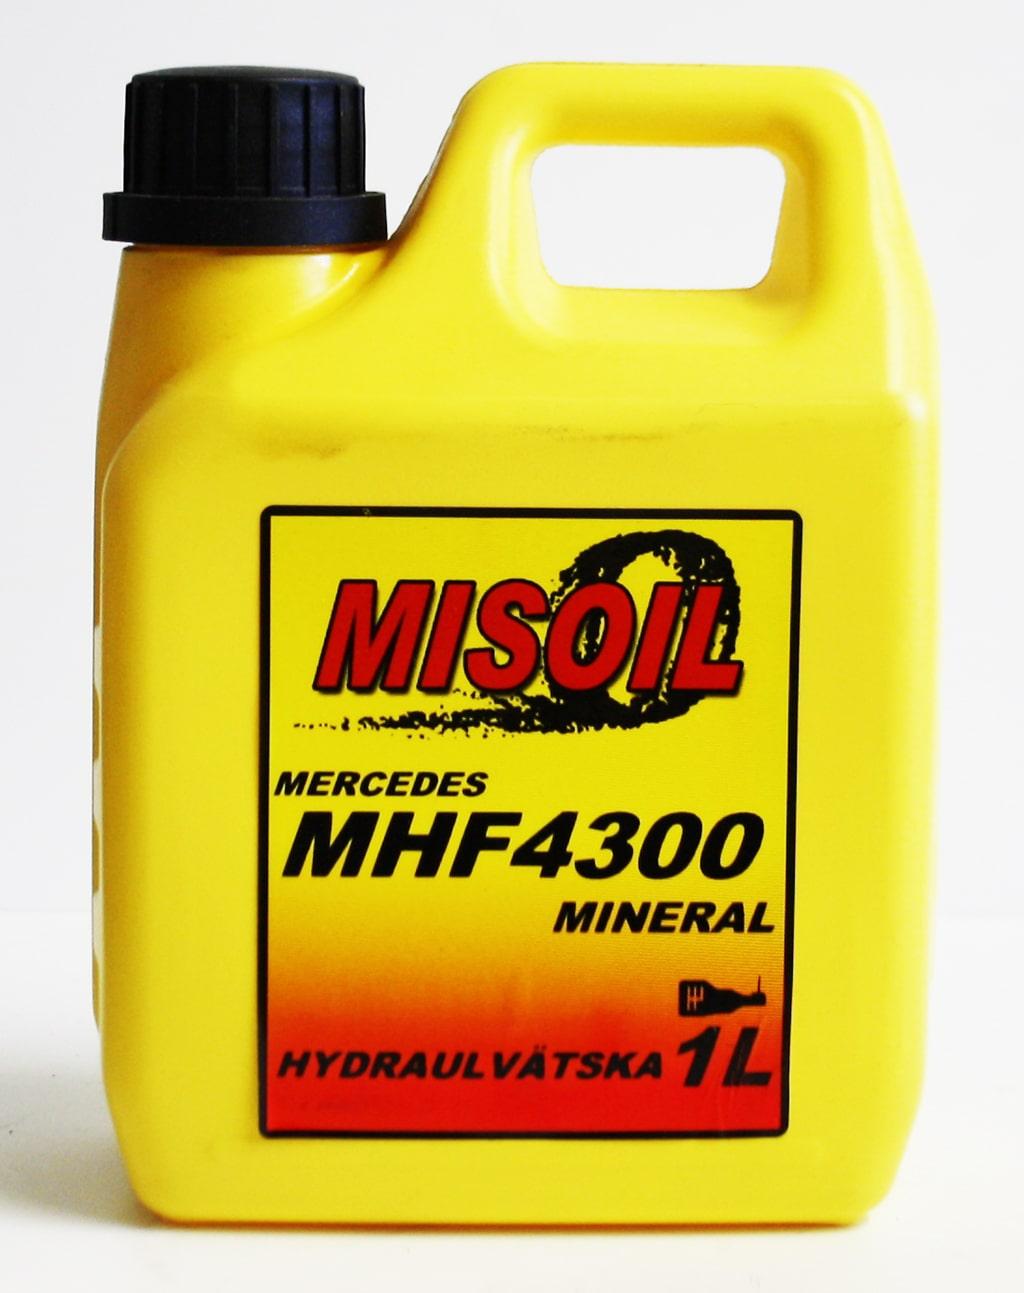 MISOIL MHF 4300